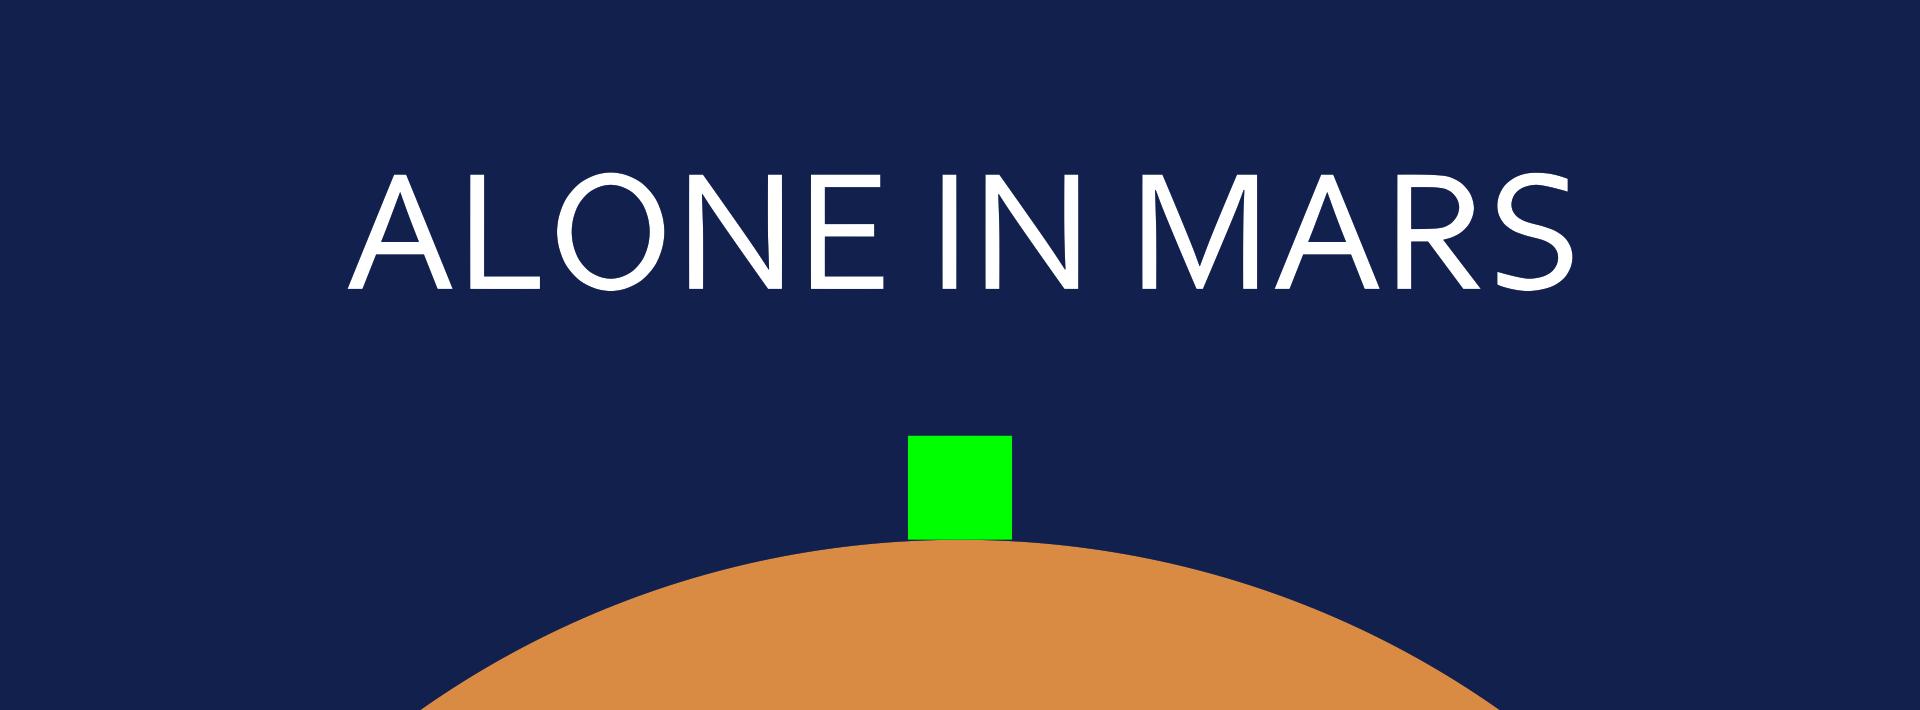 Alone In Mars